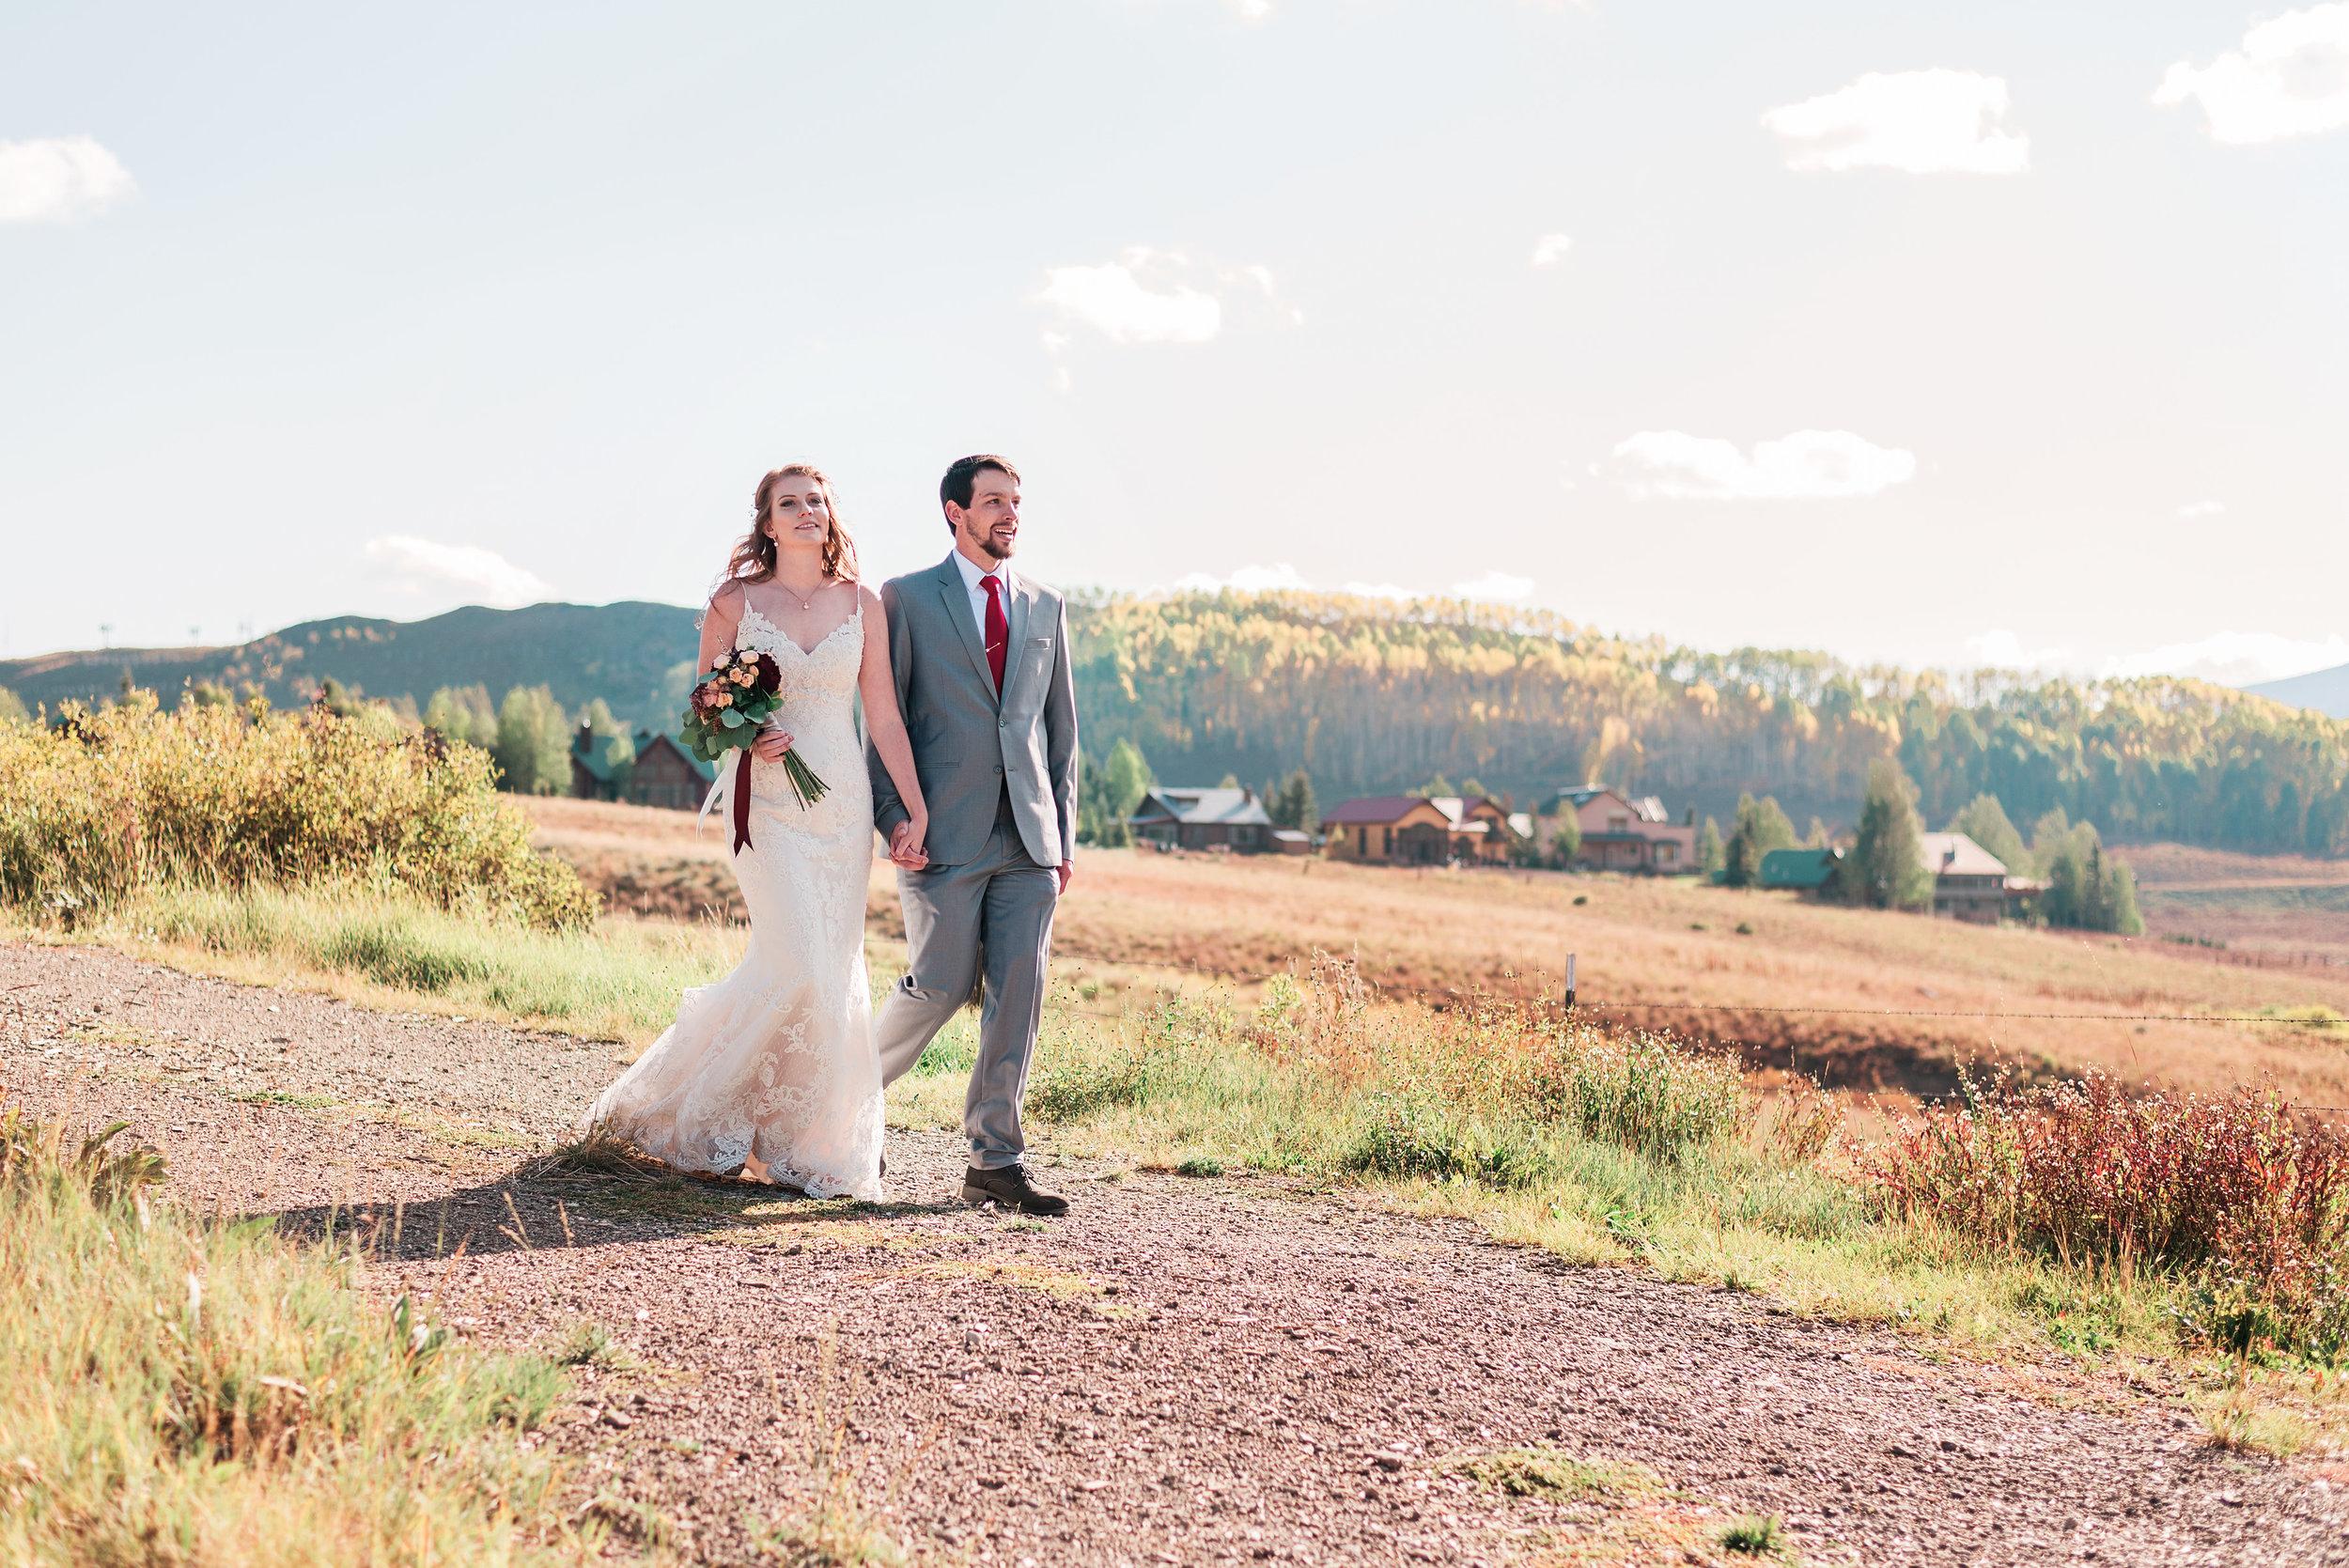 A Mount Crested Butte Colorado Wedding - Amanda Matila Photography Colorado Wedding Photographer -- Wedding Blog-The Overwhelmed Bride